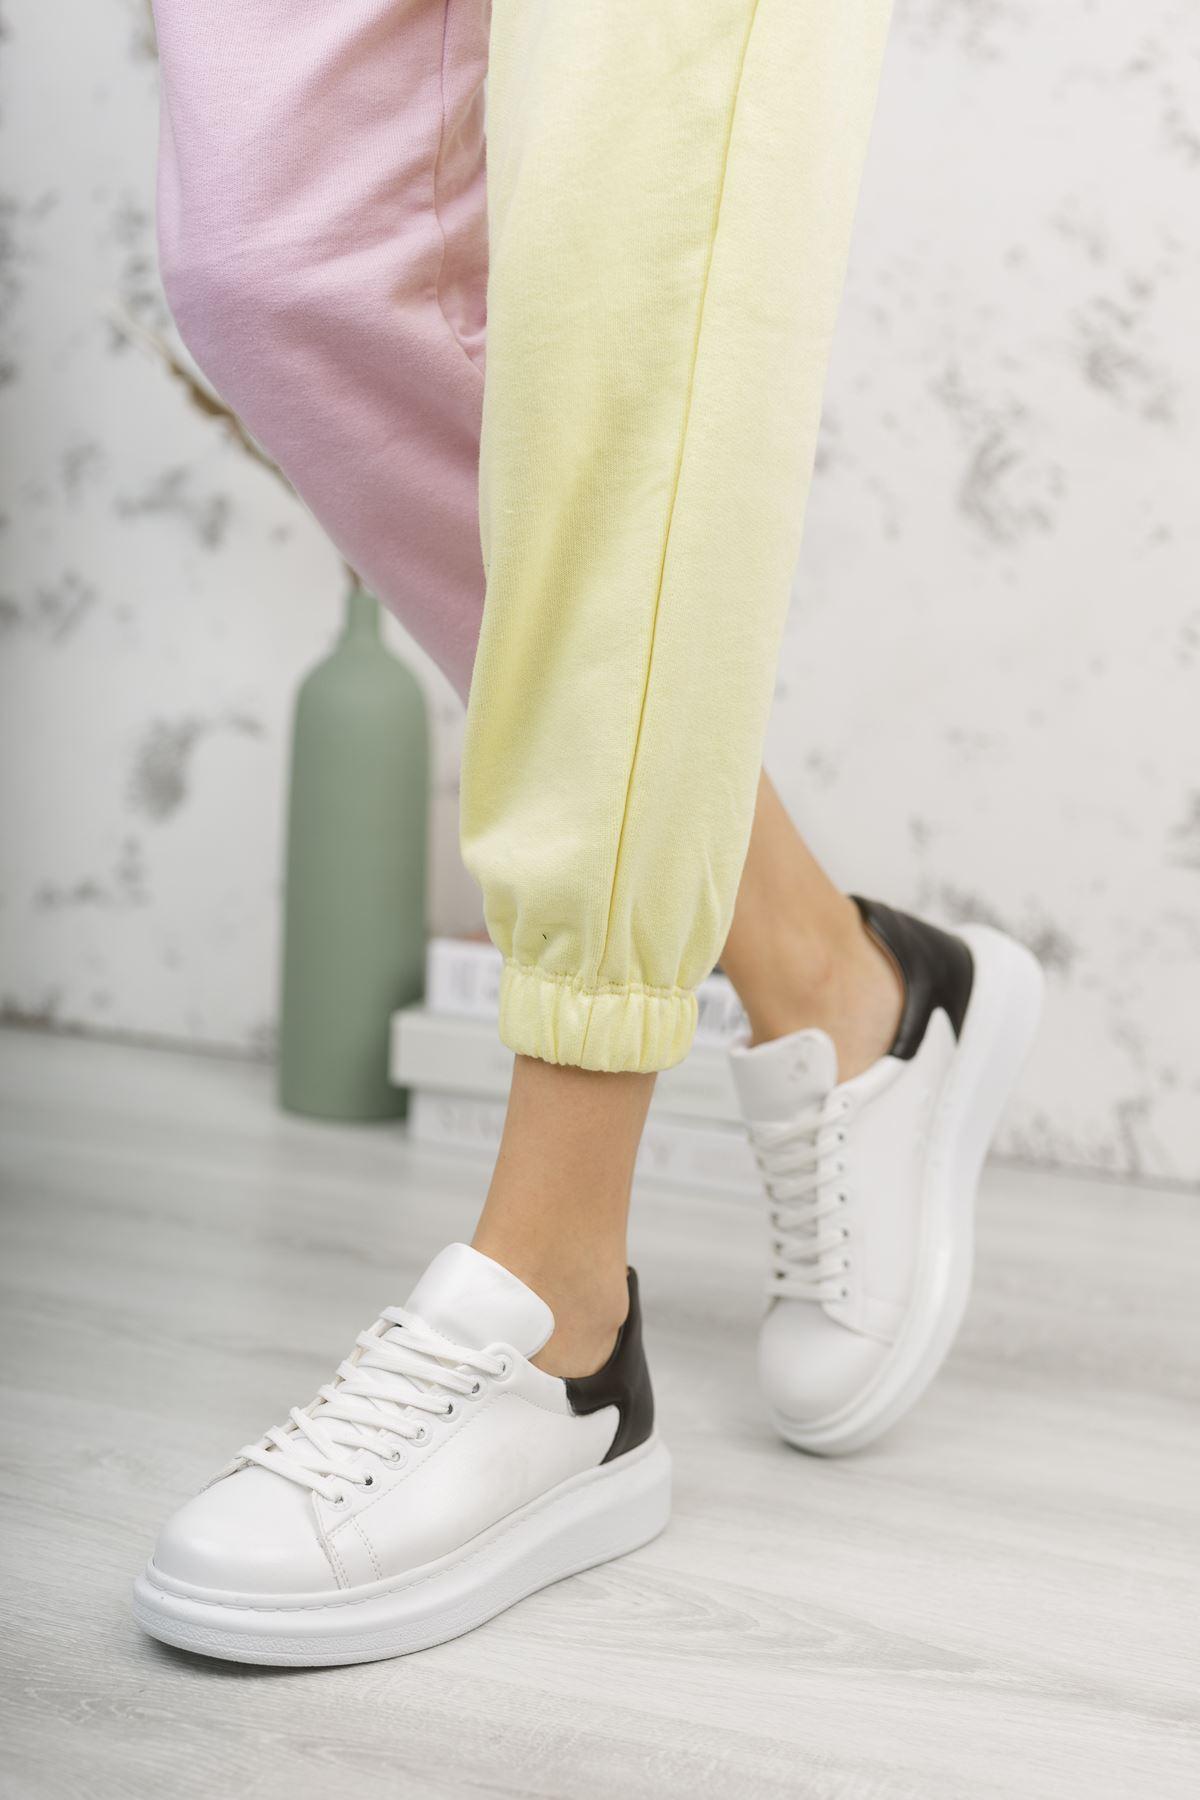 Chekich CH256 BT Kadın Ayakkabı BEYAZ/SİYAH